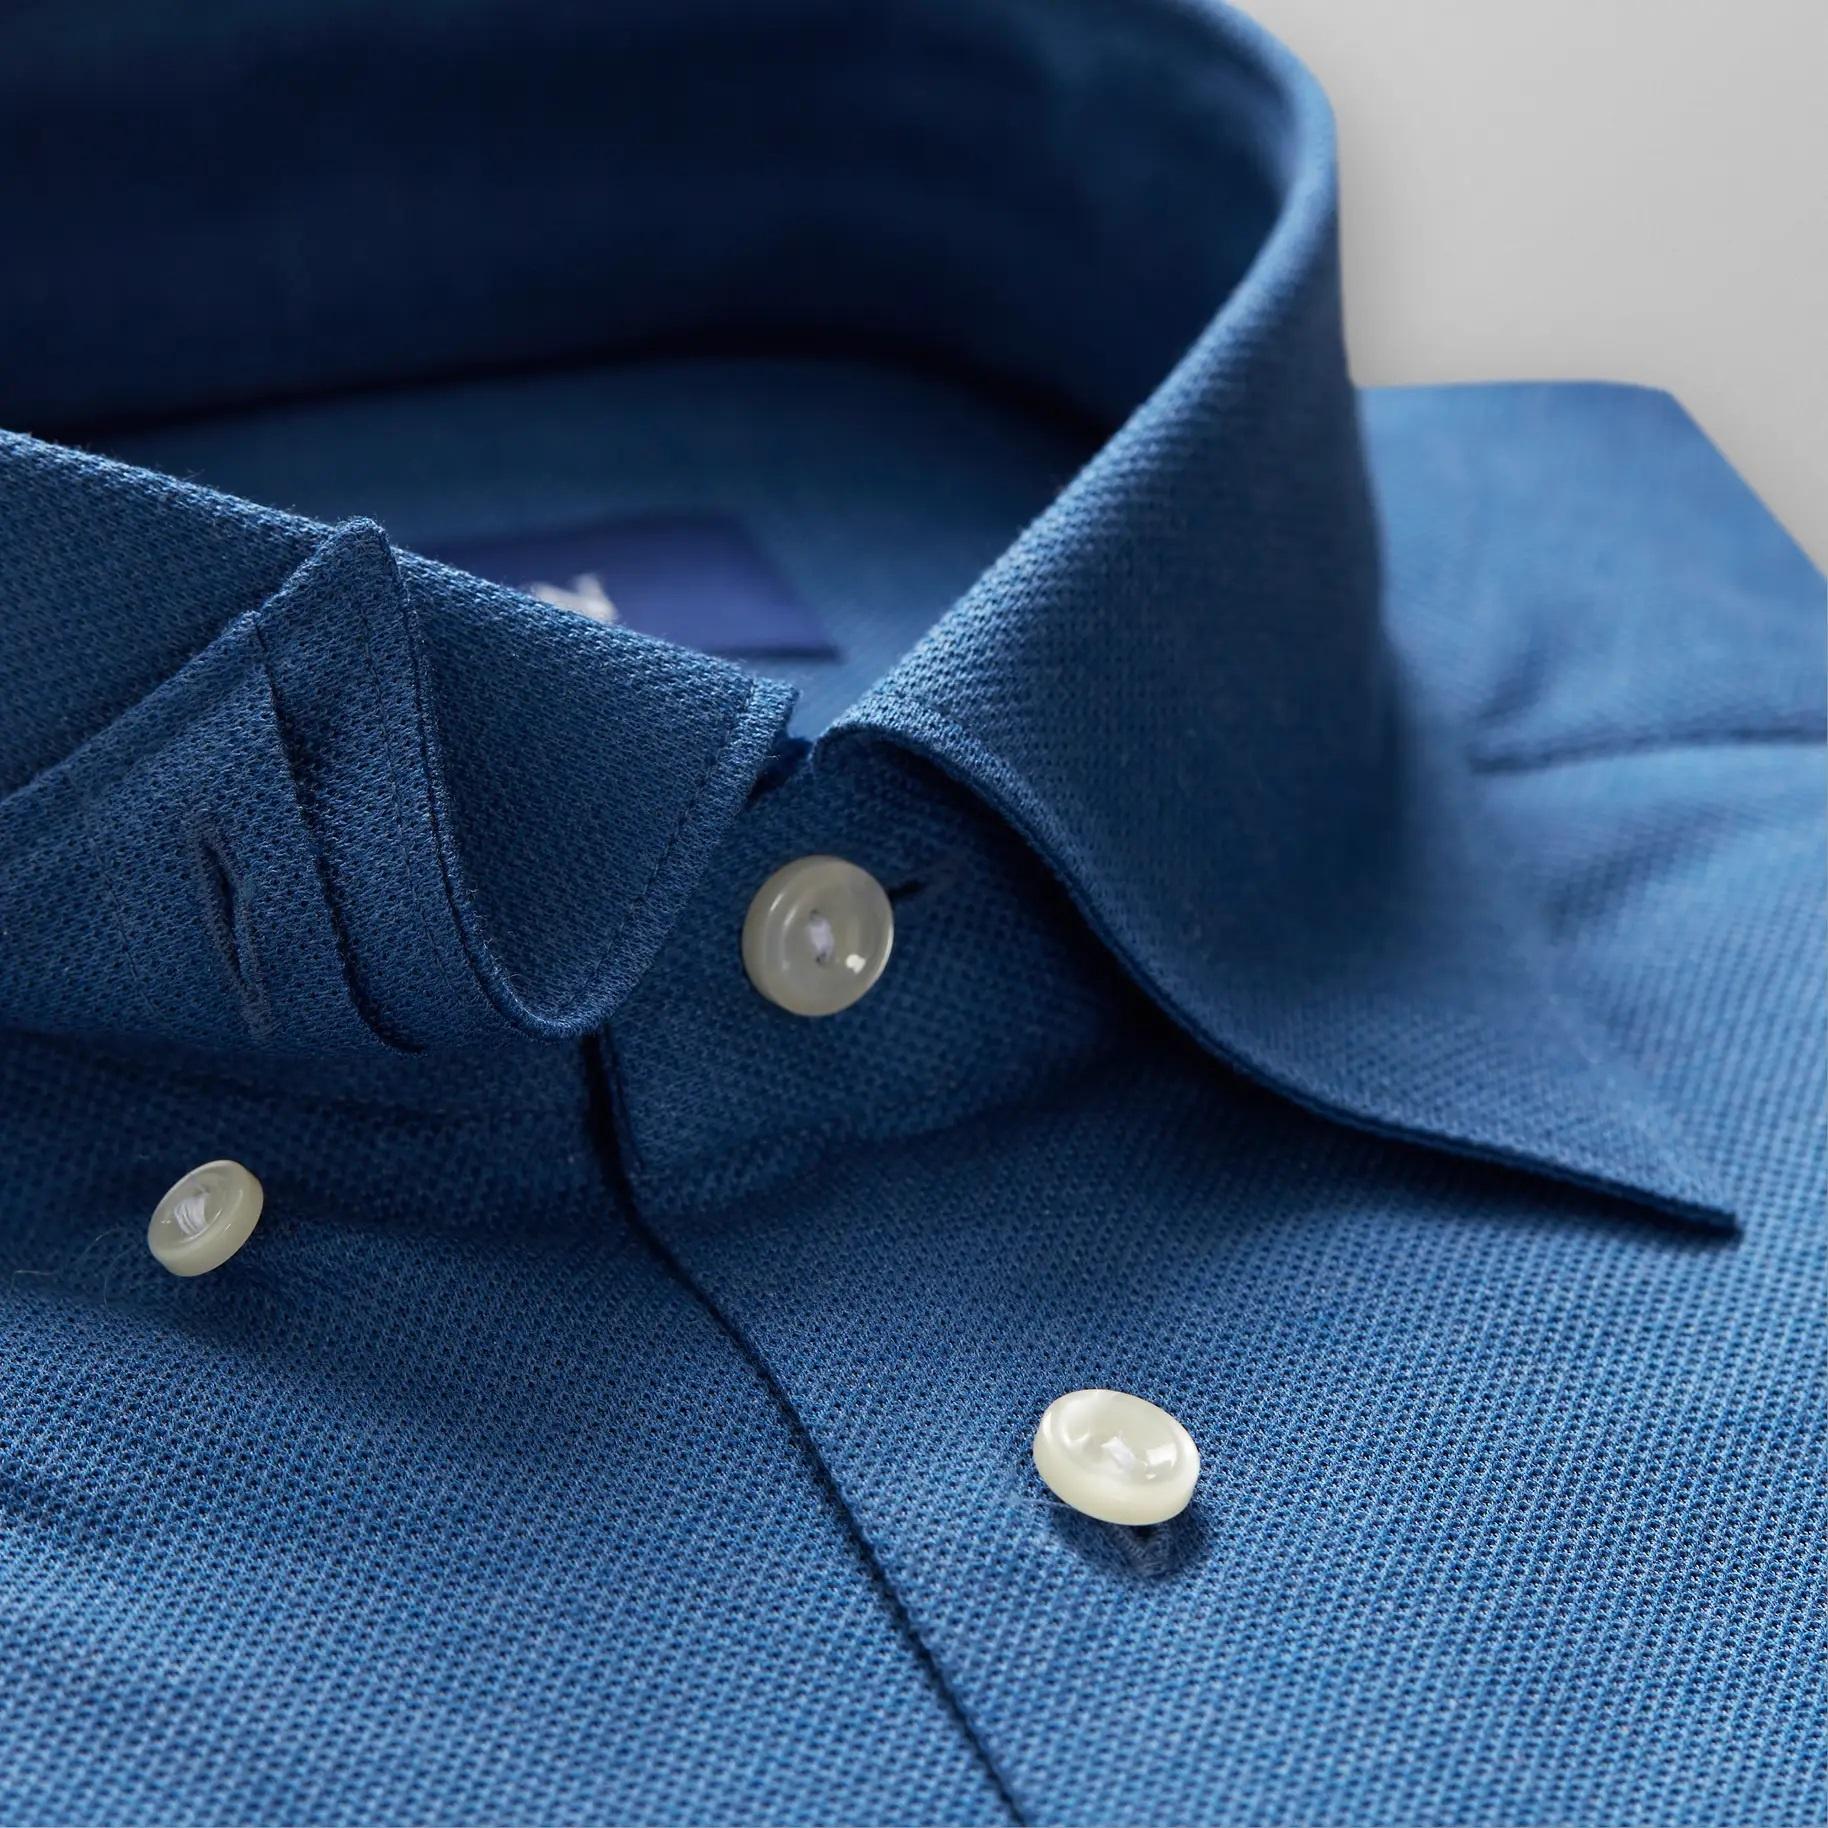 Eton Knitted Pique with button under collar